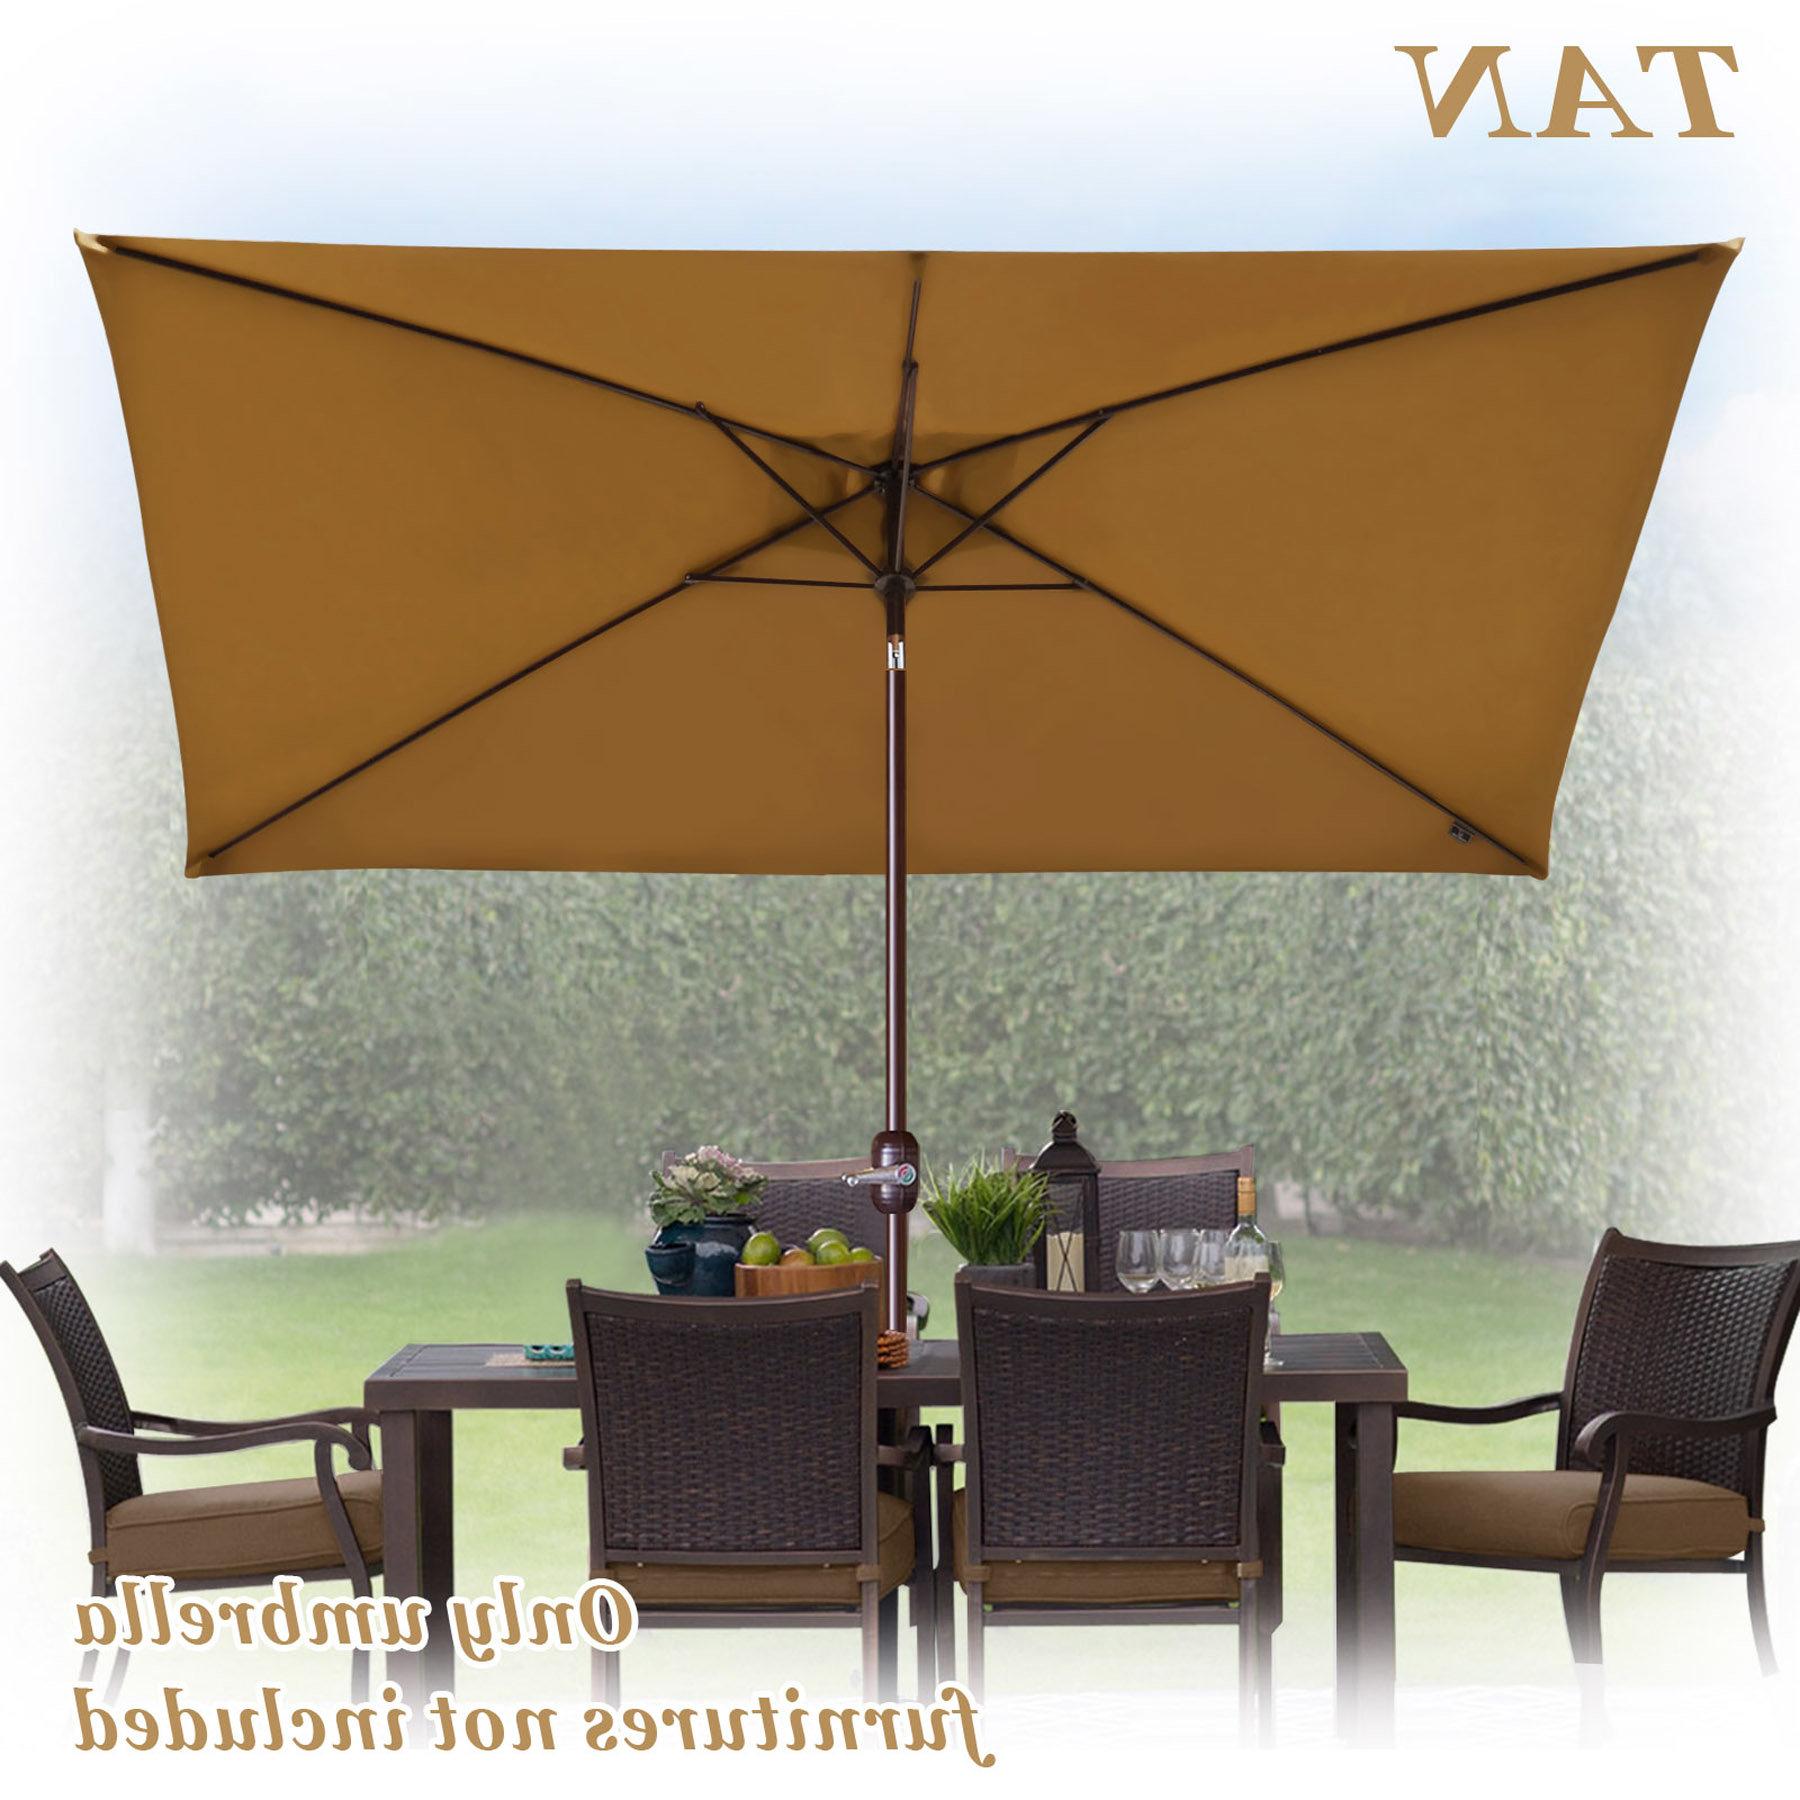 Lonoke Patio Rectangular Market Umbrellas For Well Known Bickford Outdoor Garden Patio Market Umbrella (View 6 of 20)